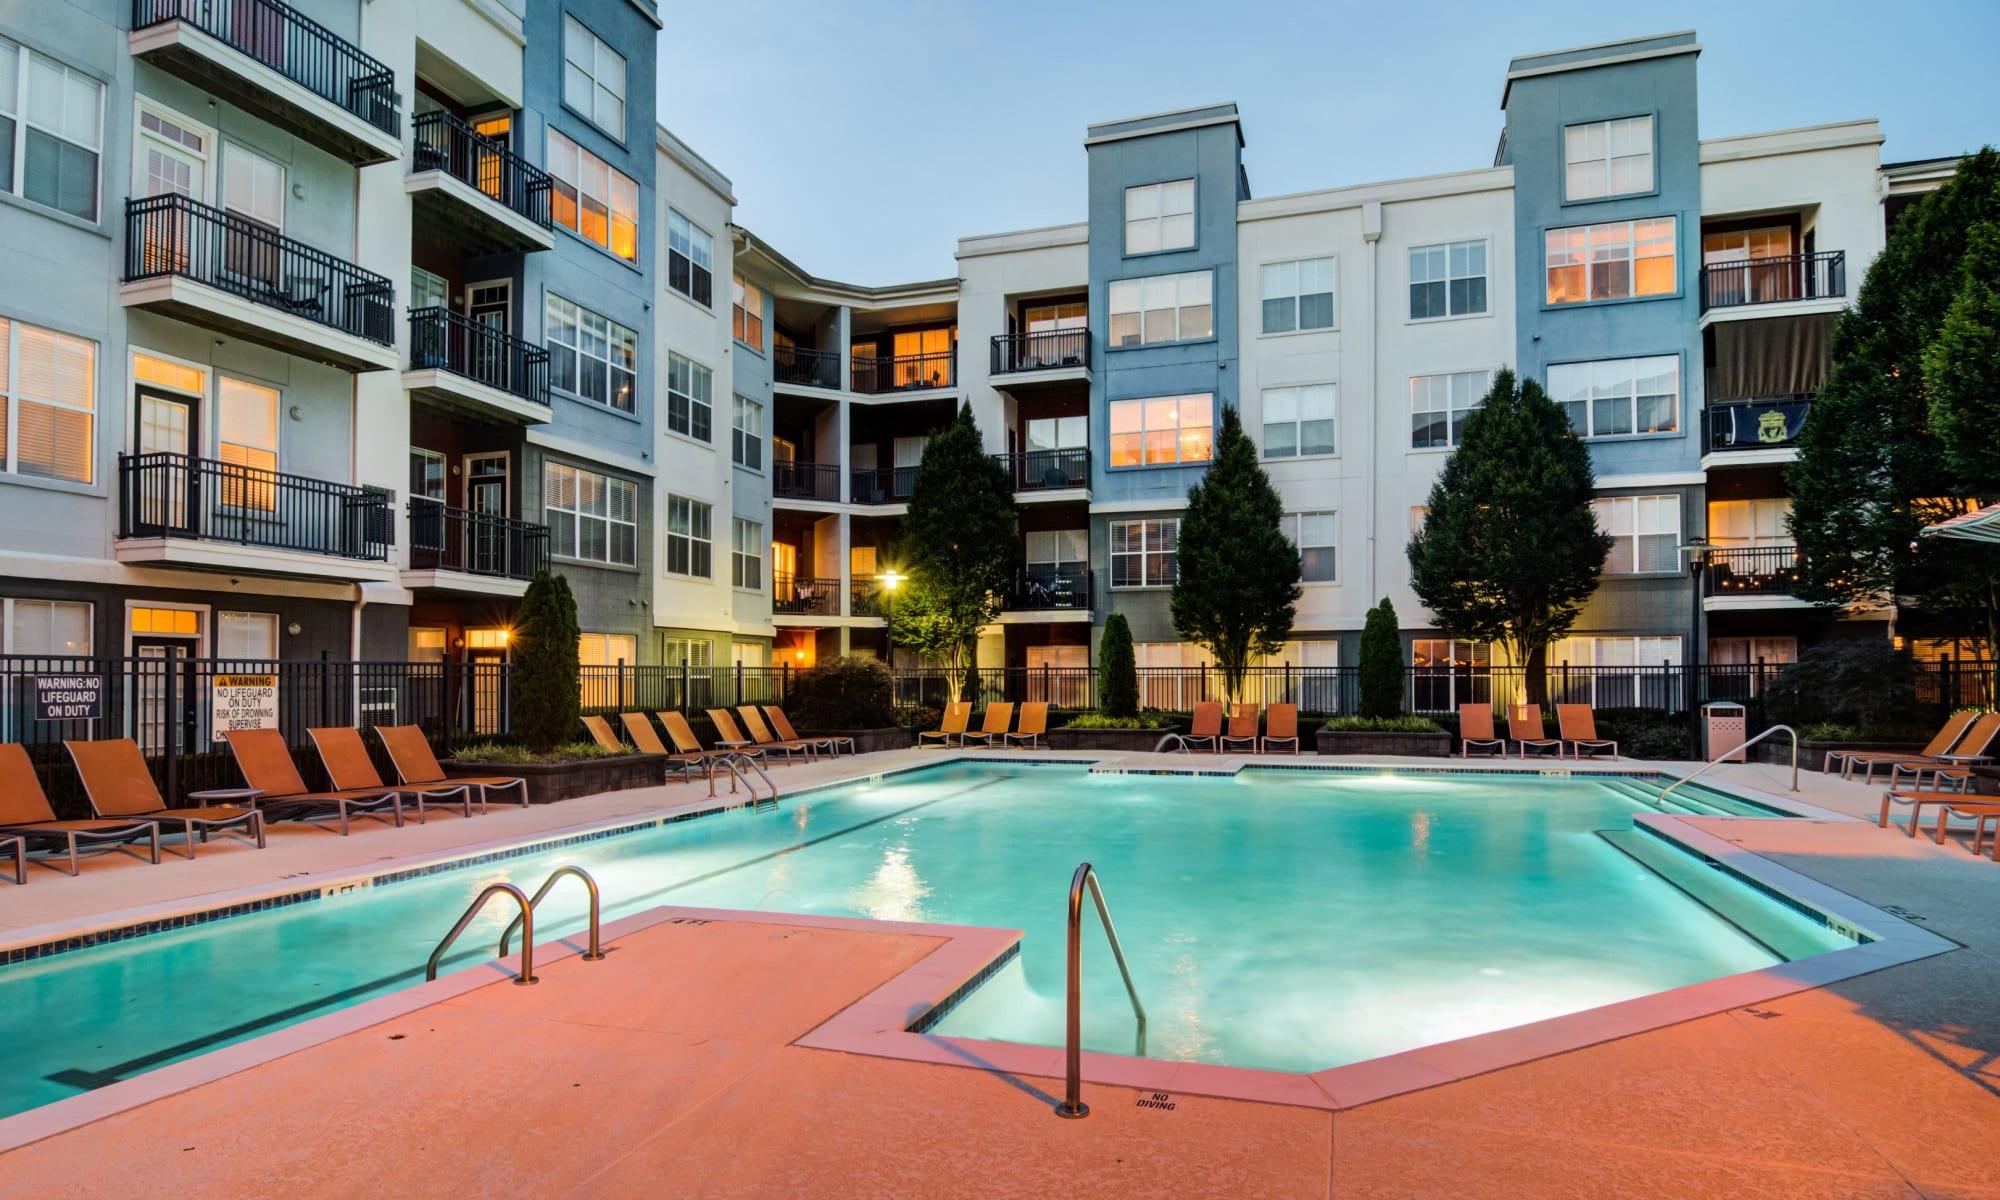 Luxury apartments in Atlanta, GA